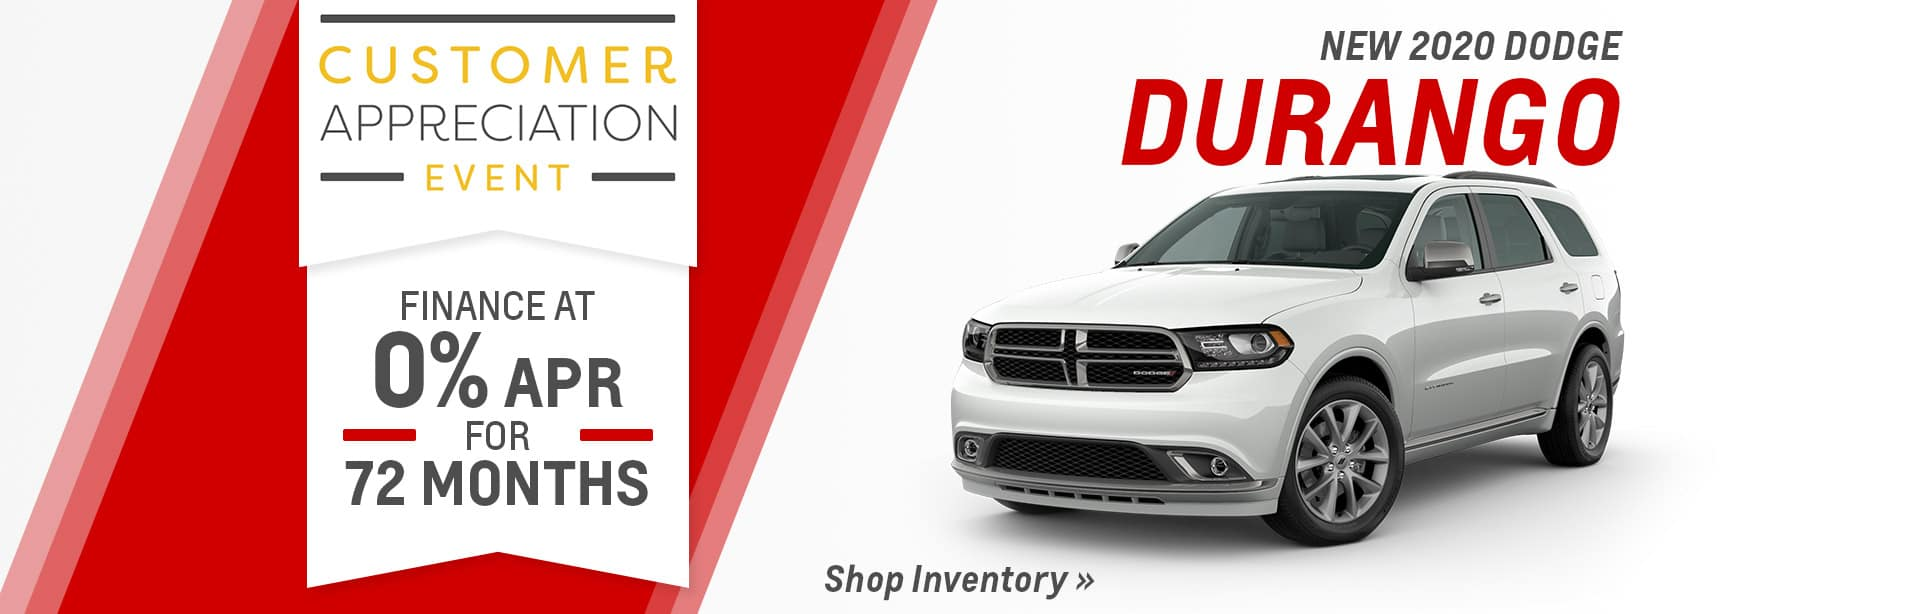 2020 Durango Inventory in Auburn, Indiana.